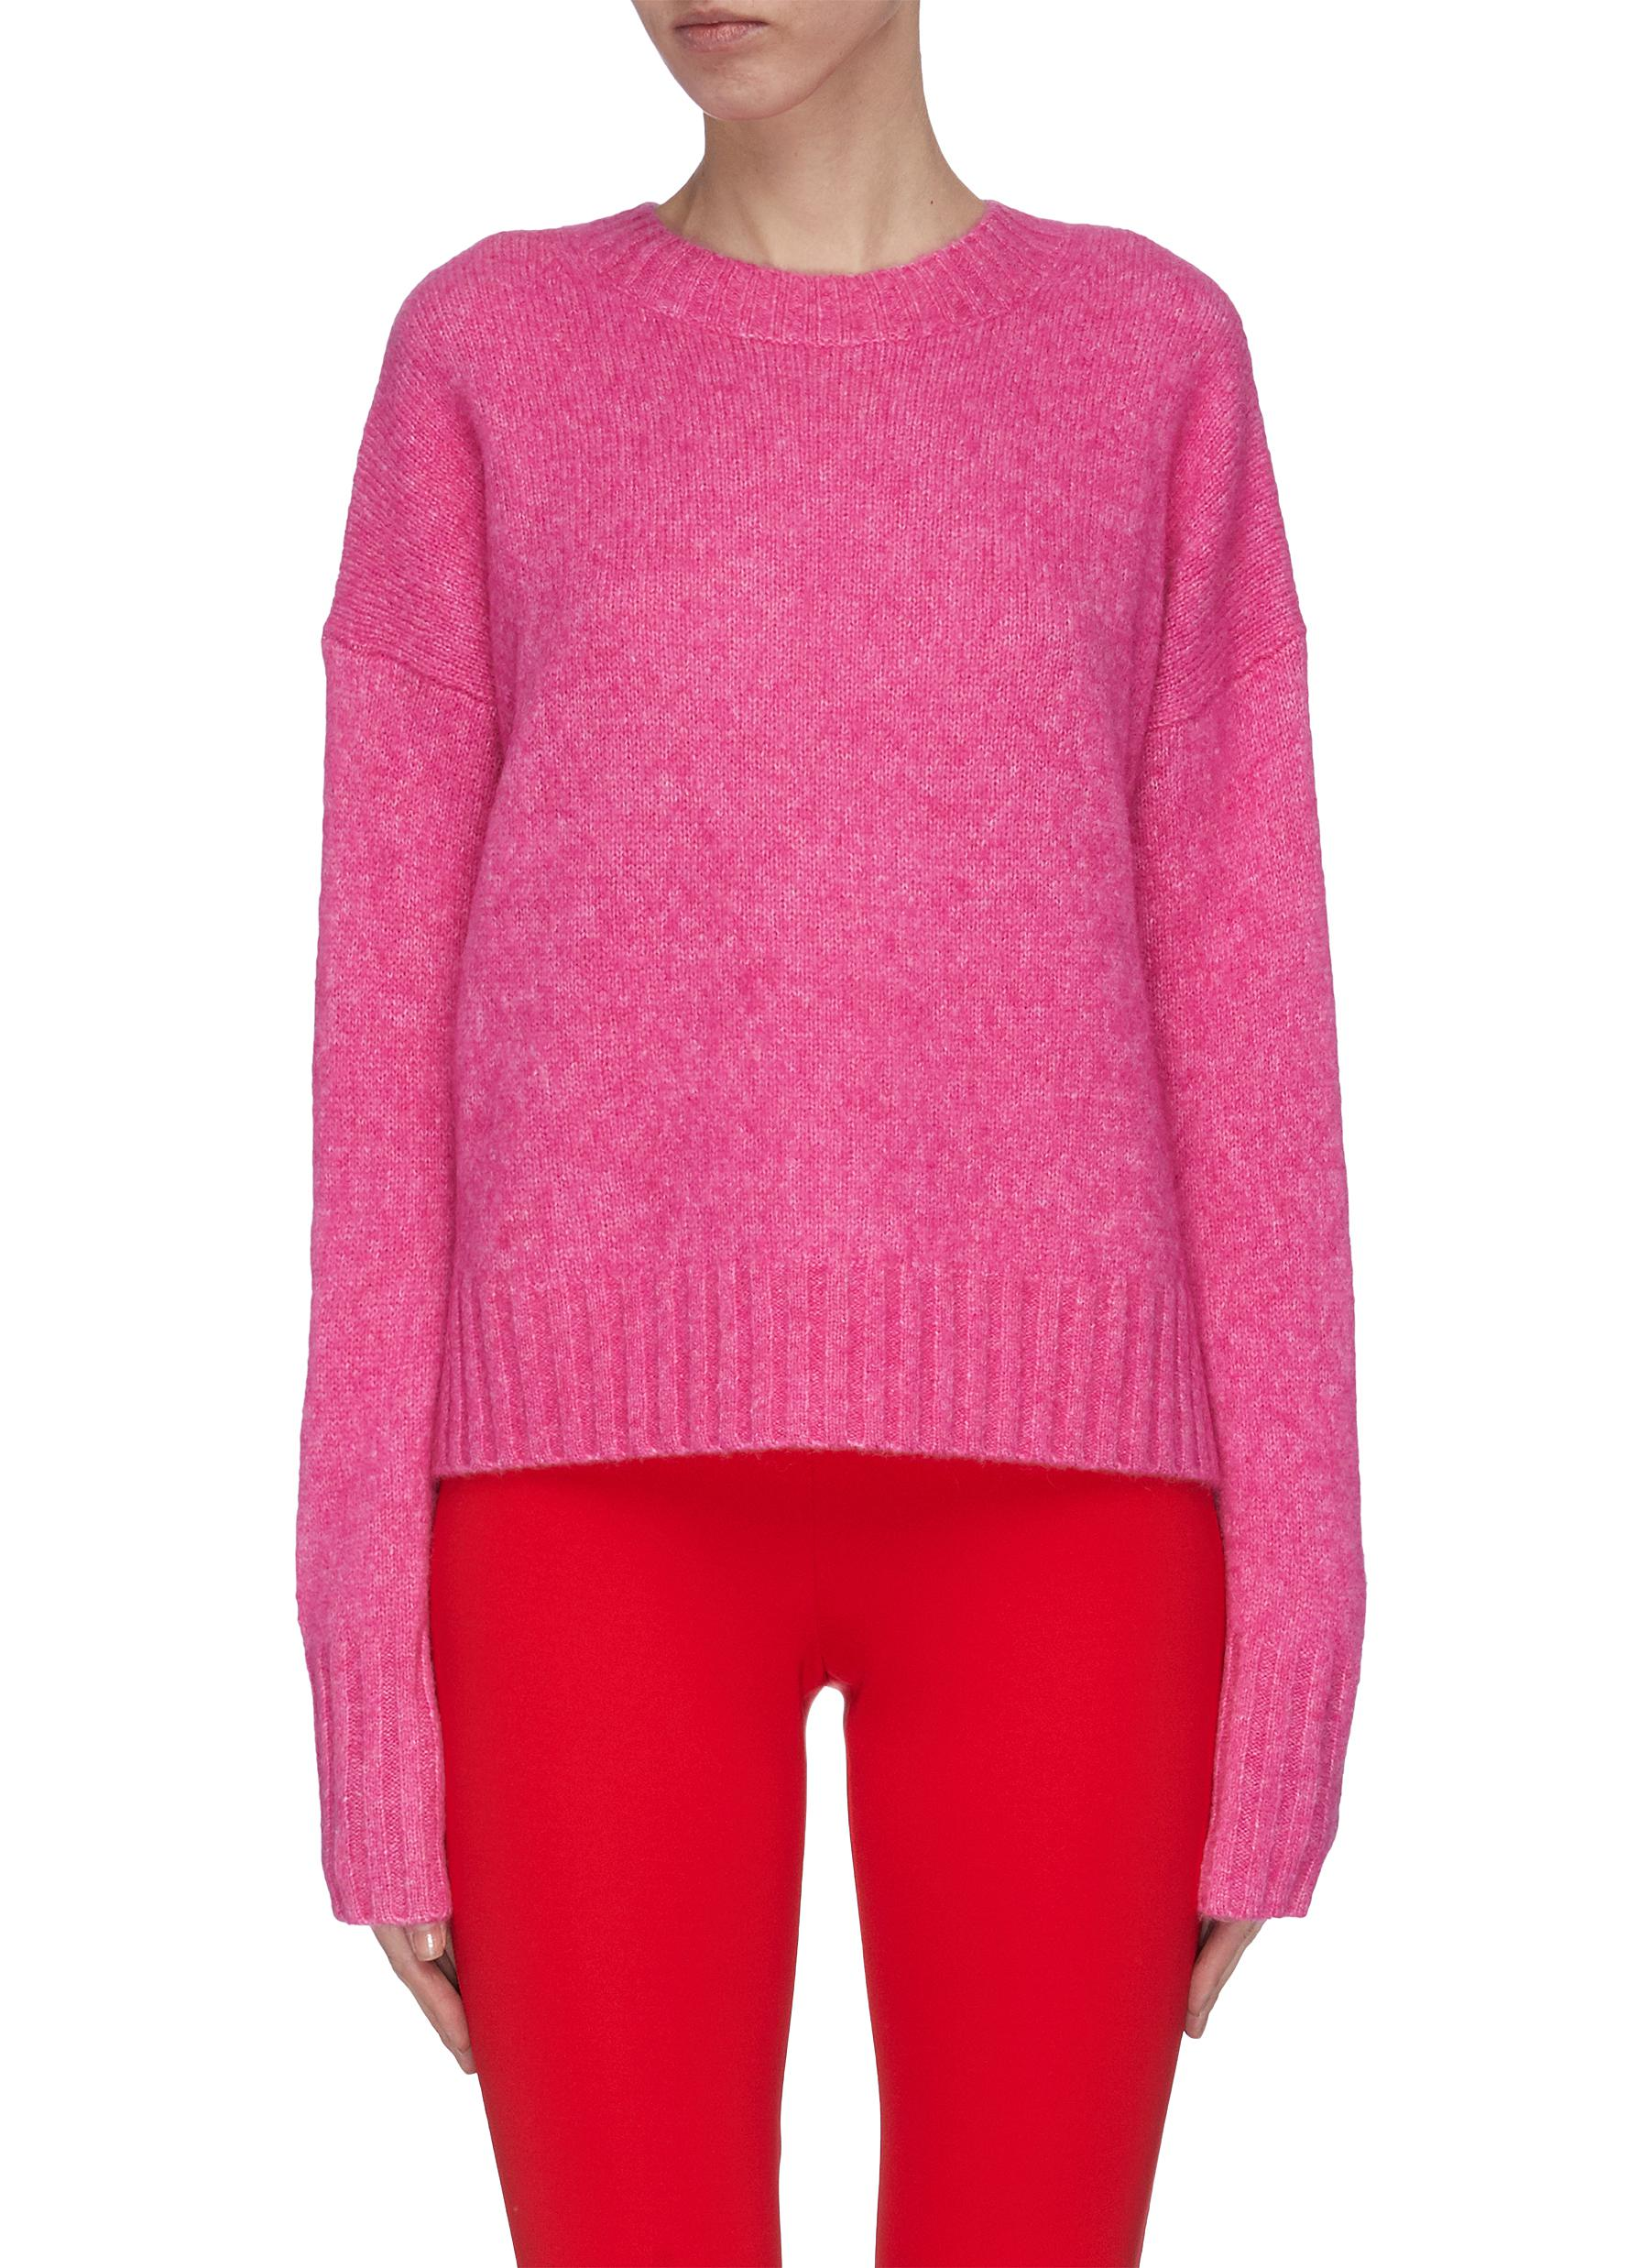 Buy Helmut Lang Knitwear Recut brushed crewneck wool knit sweater